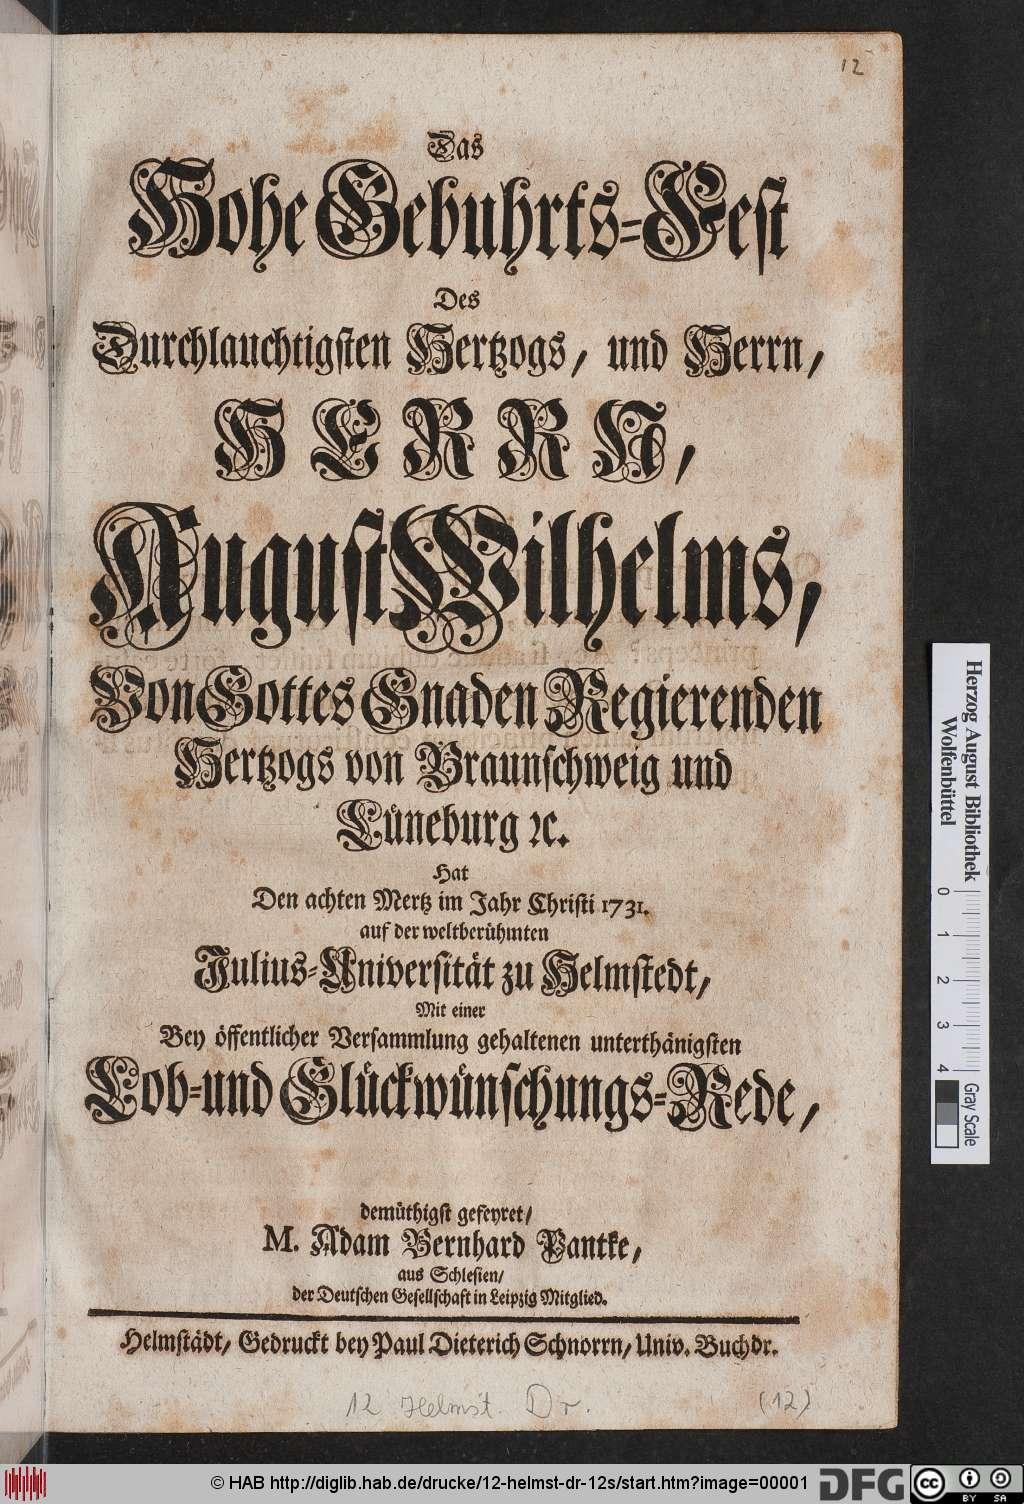 http://diglib.hab.de/drucke/12-helmst-dr-12s/00001.jpg